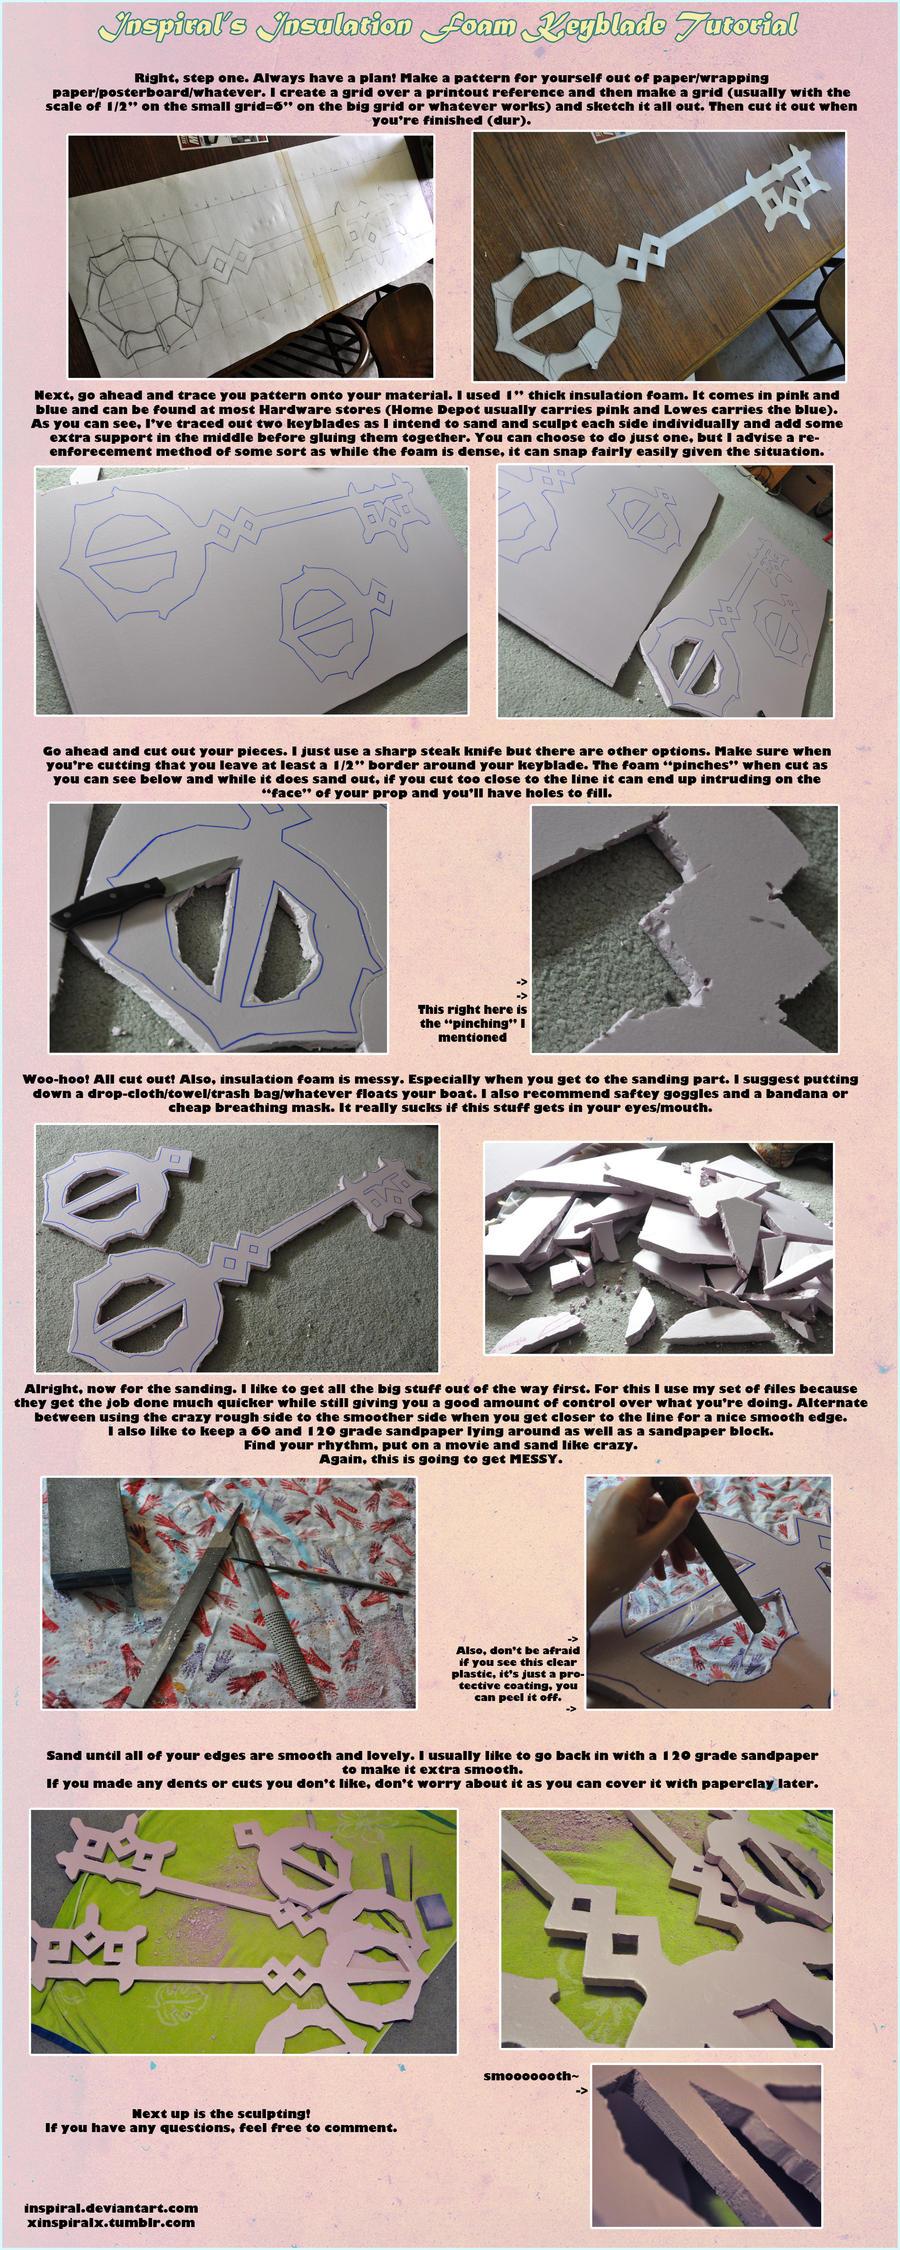 insulation foam keyblade tutorial pt1/2 by Inspiral